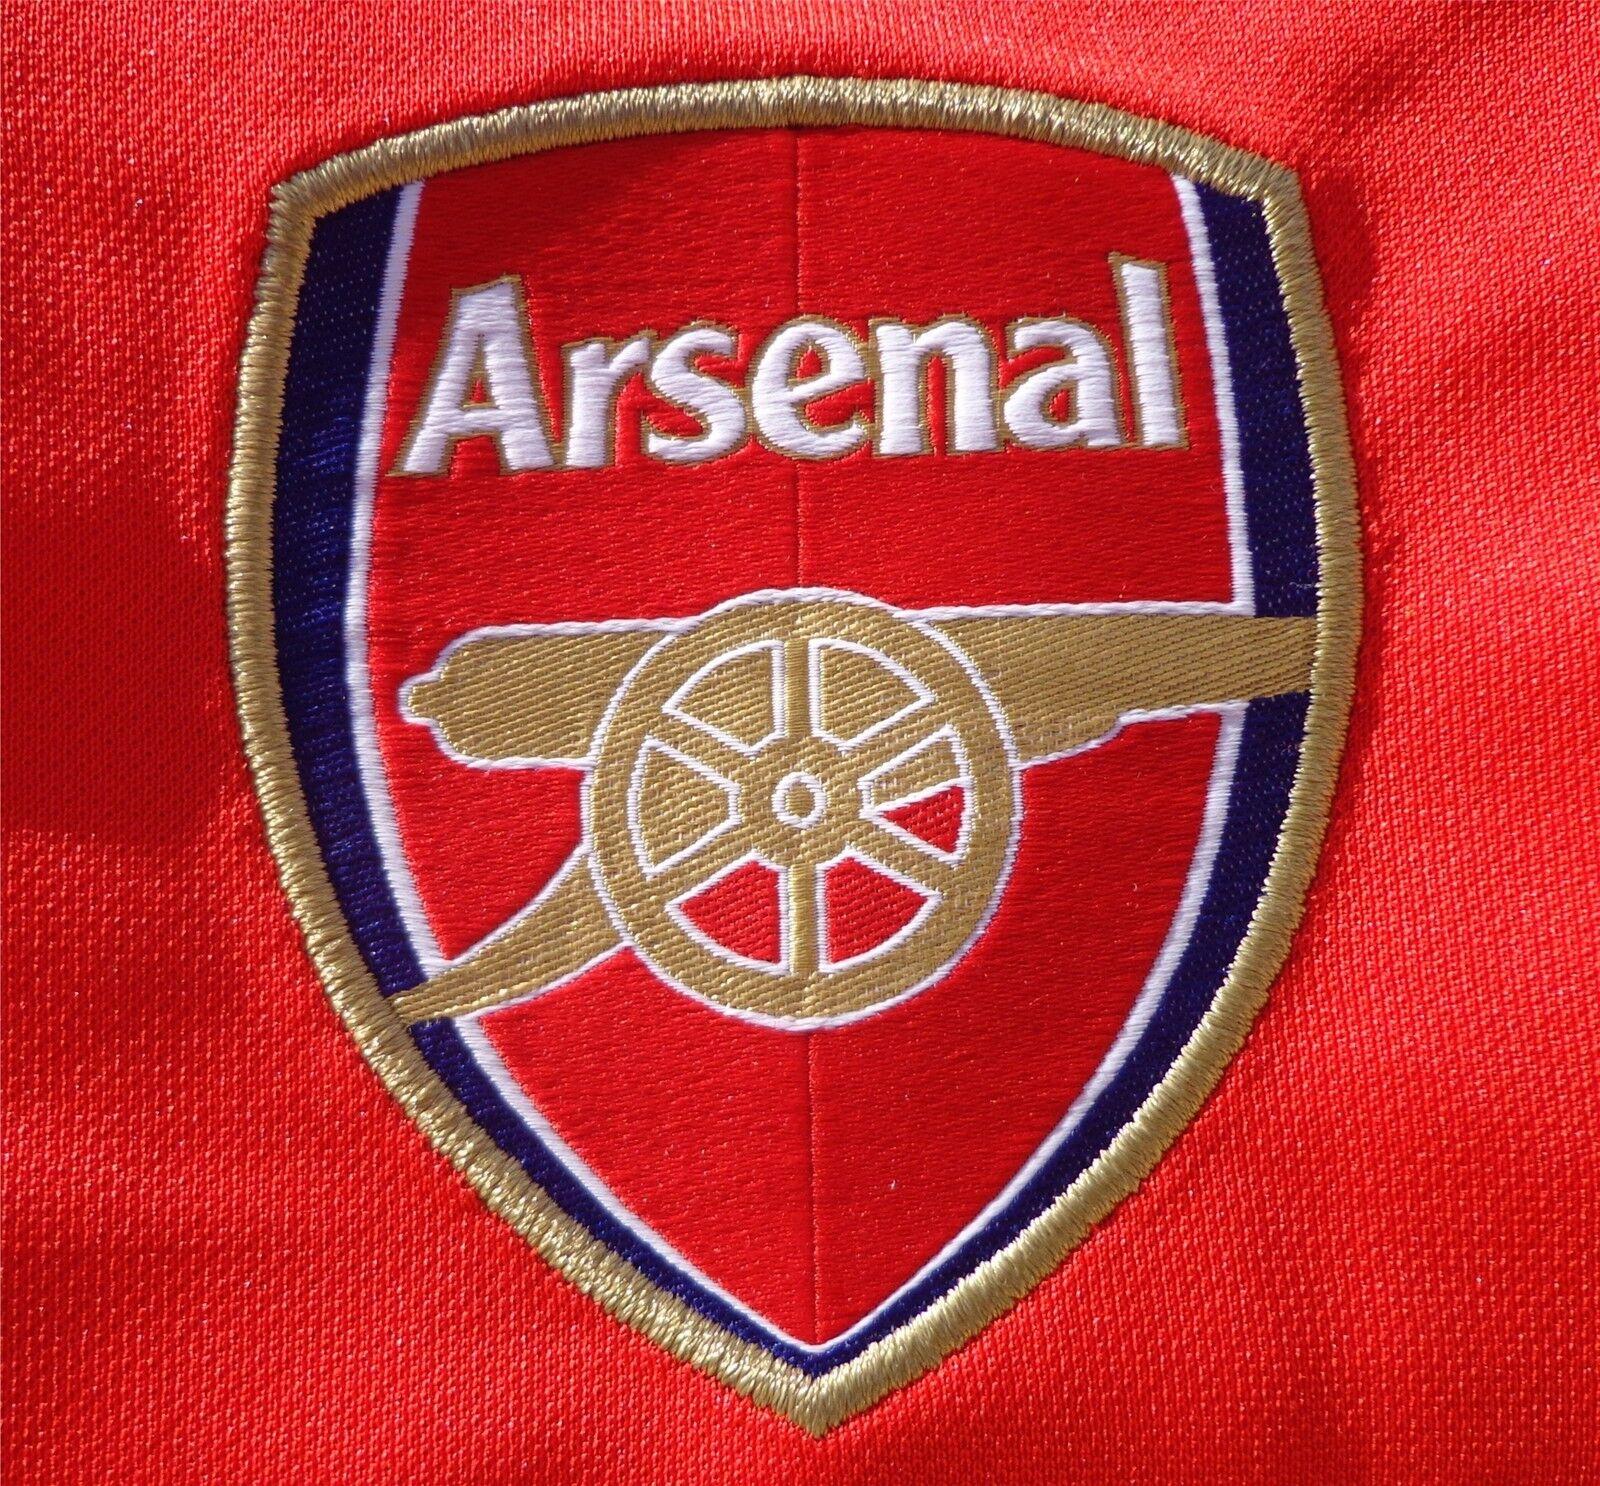 ARSENAL LONDON Trikot Jersey PUMA Größe Größe Größe S-M + NEU + THE GUNNERS + ENGLAND + 3525a6